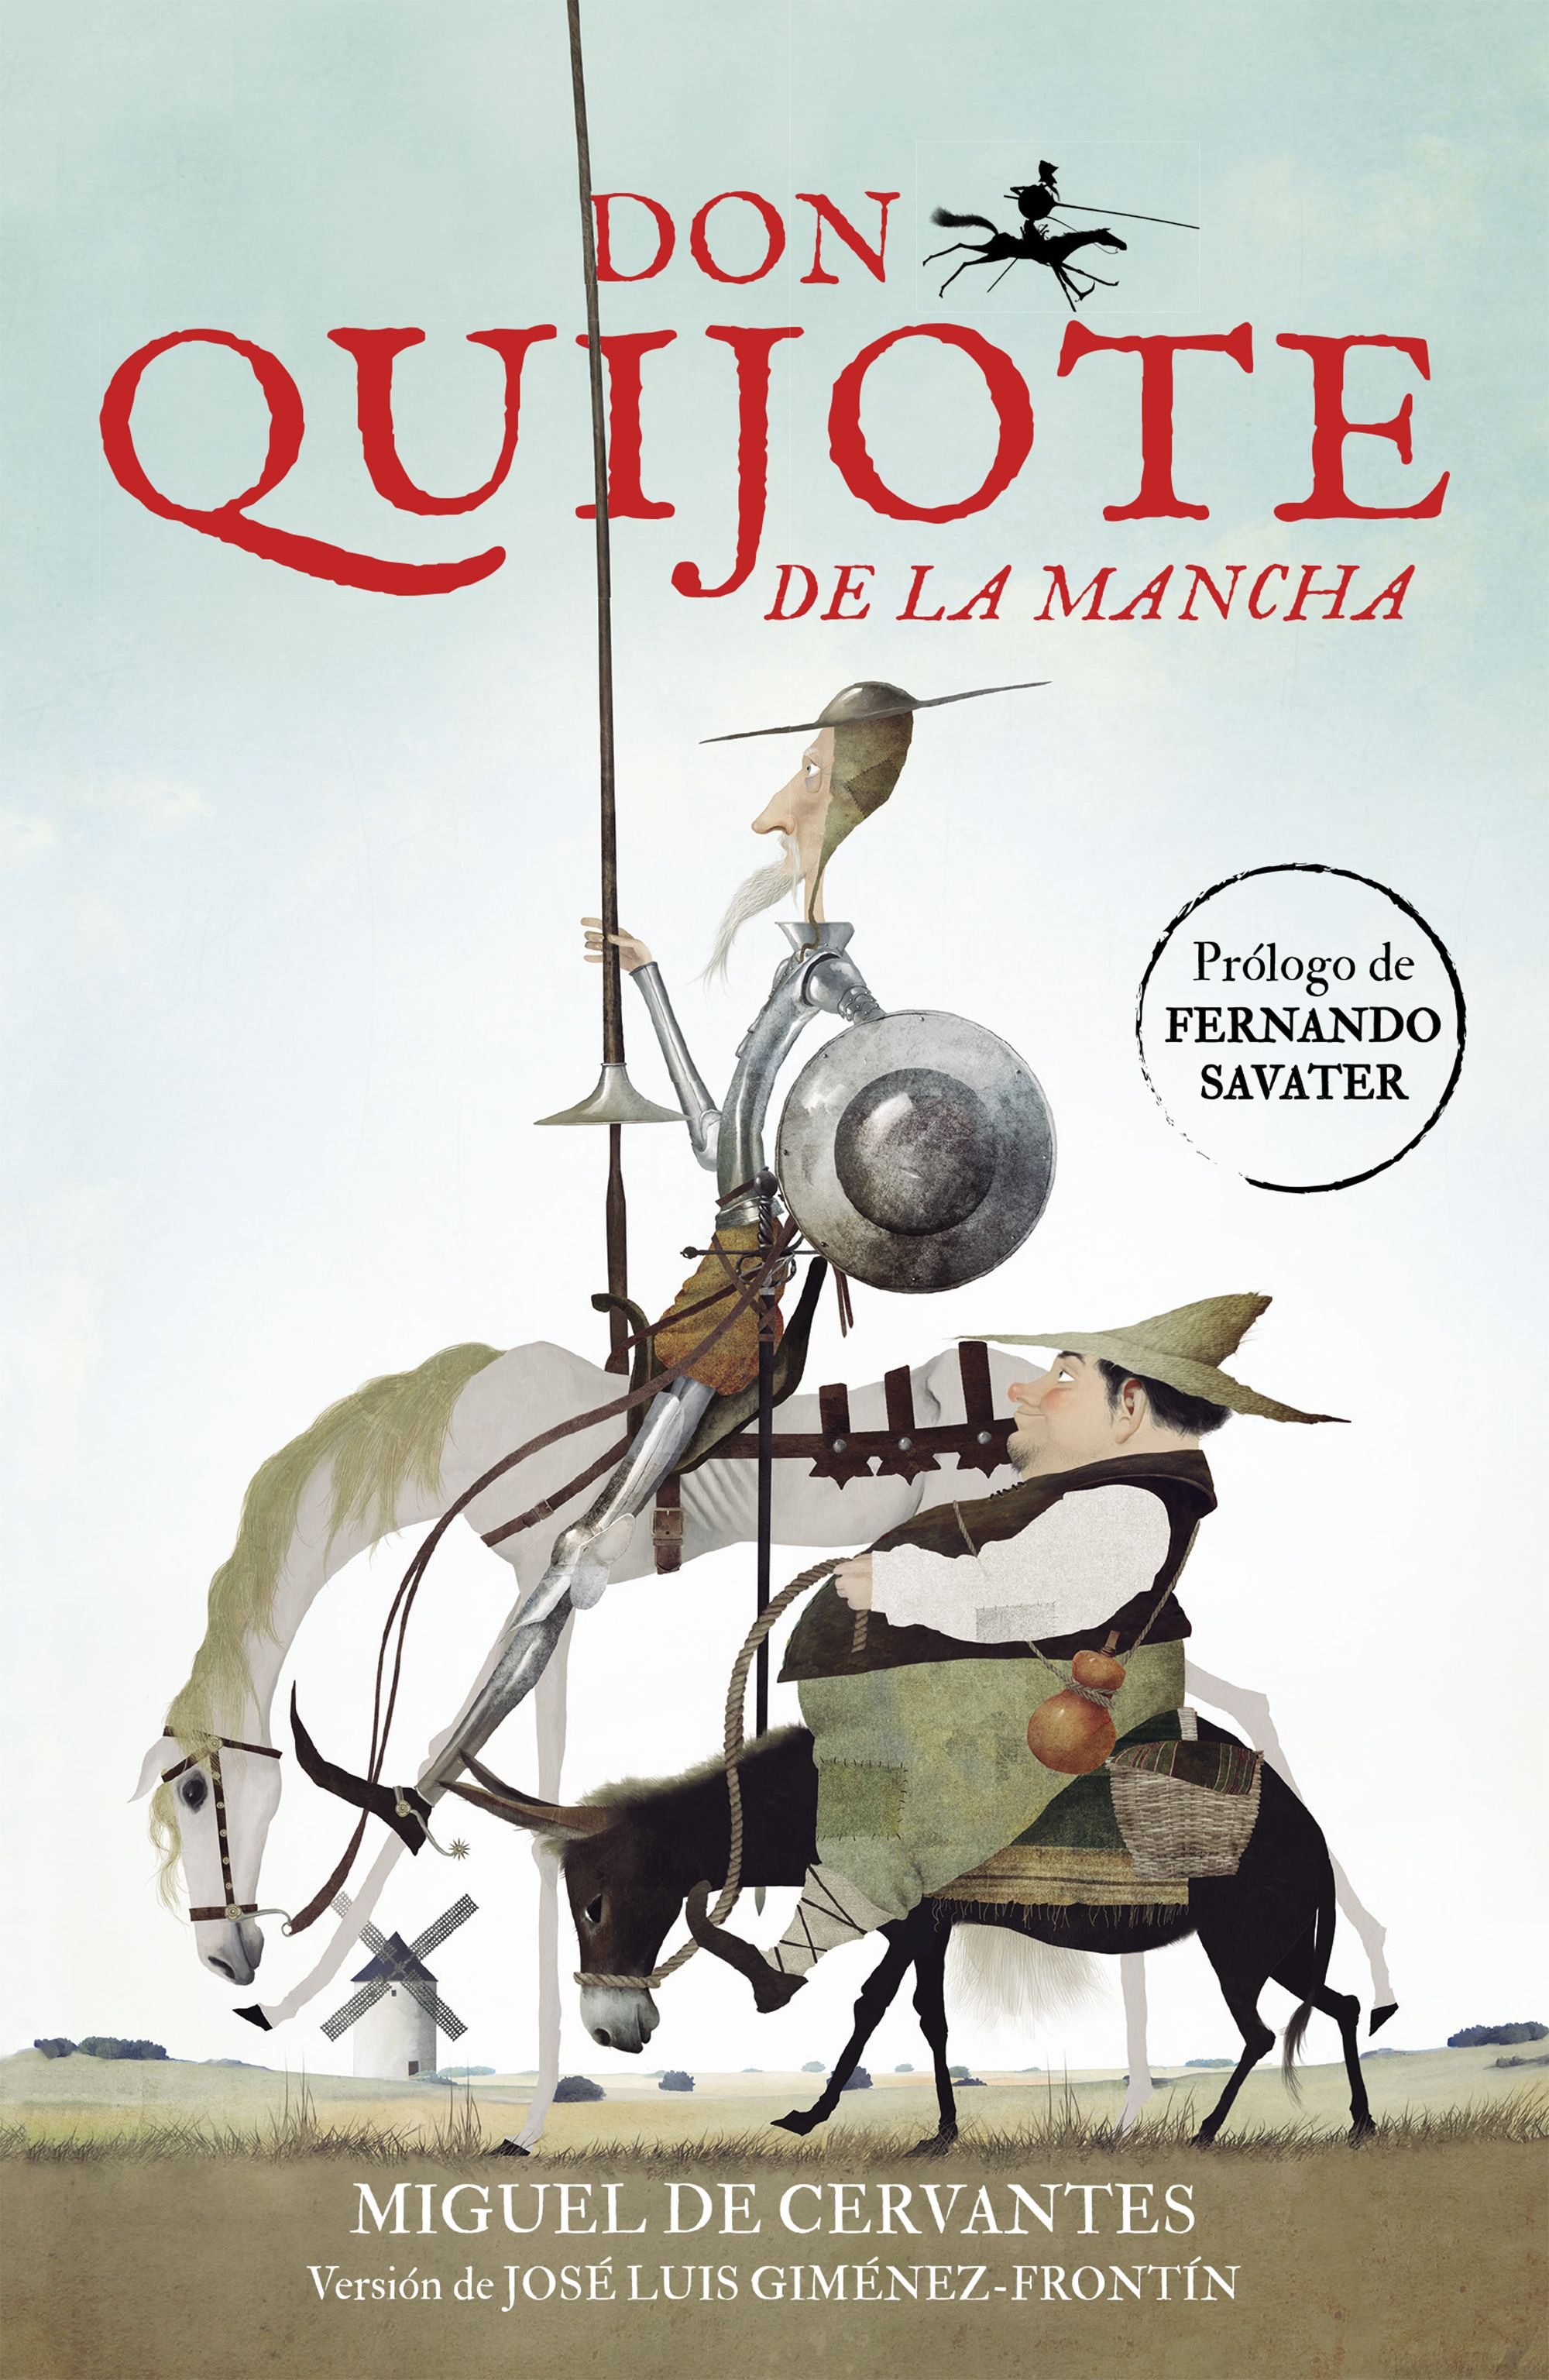 Don Quijote De La Mancha José Luis Giménez Frontín Editorial Alfaguara Don Quijote Quijote De La Mancha Don Quijote Dibujo